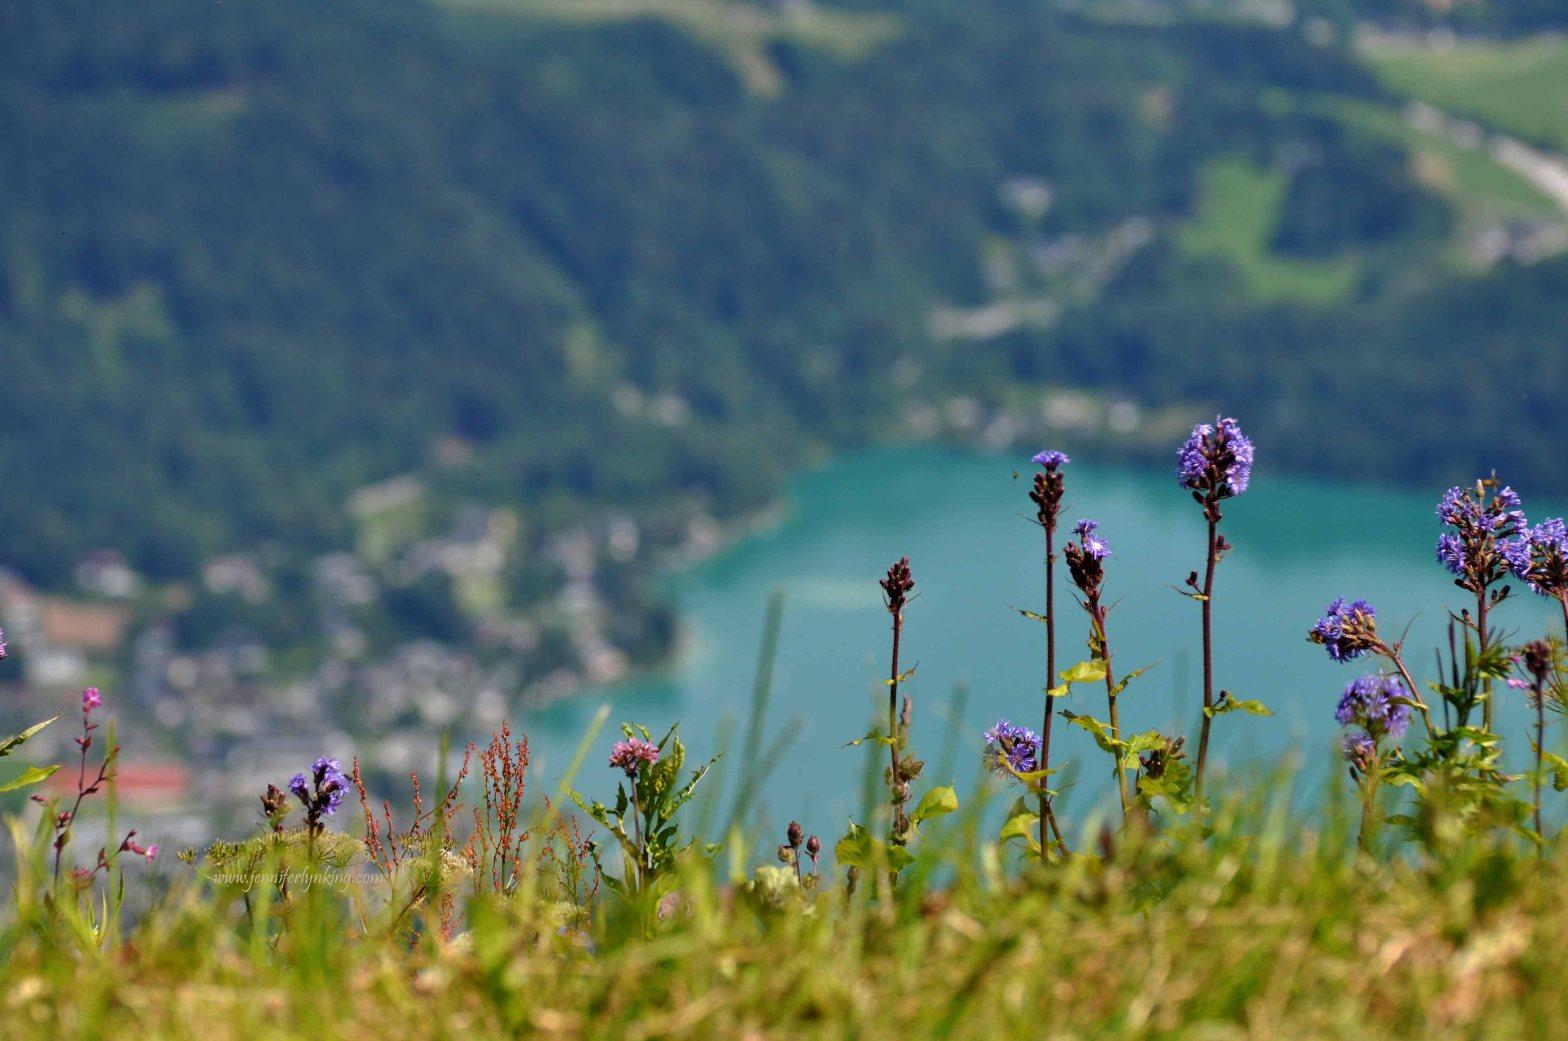 Paradise Found: St. Gilgen, Austria and the Zwolferhorn